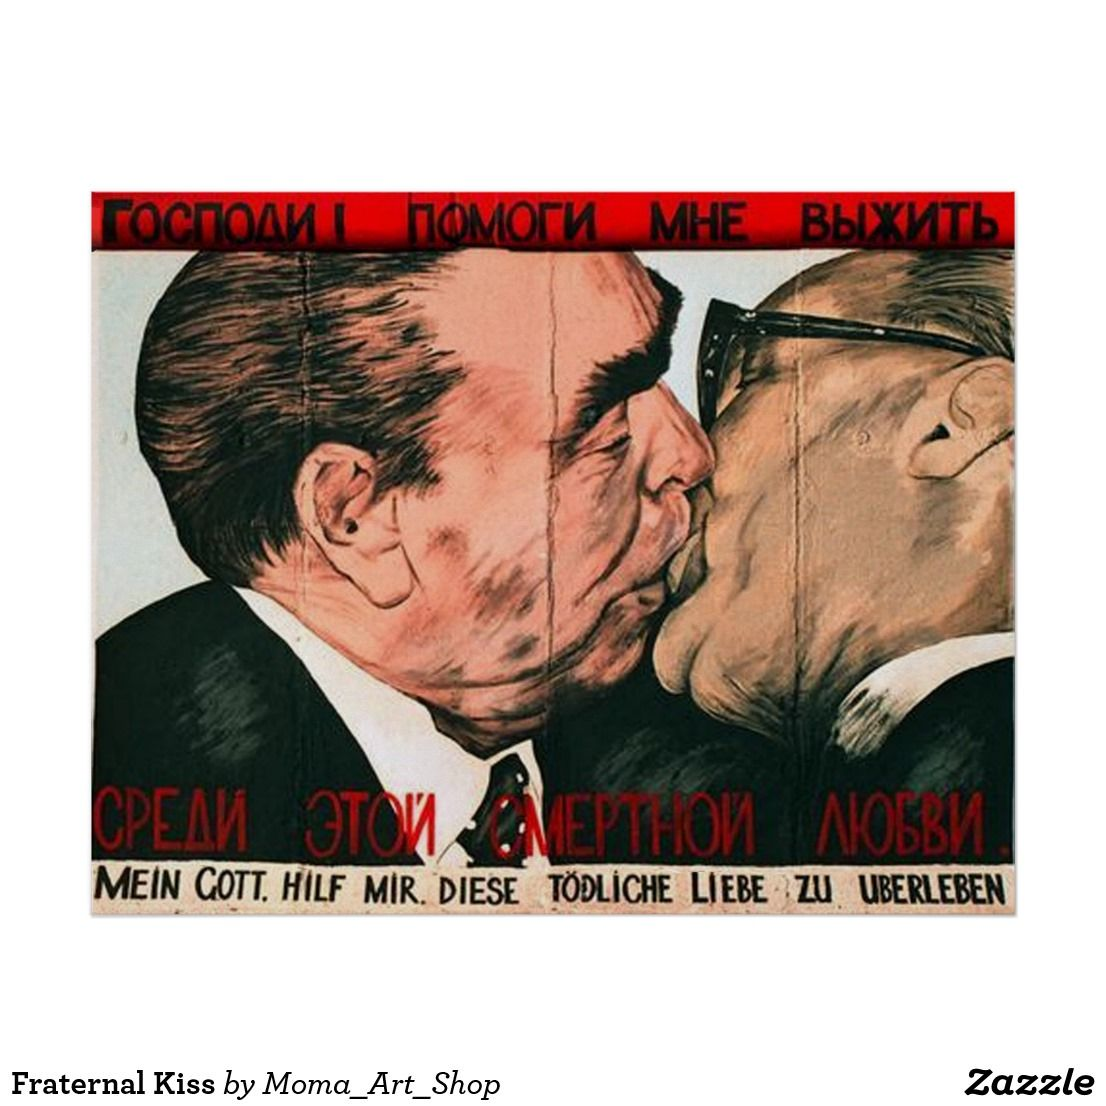 Fraternal Kiss Poster Zazzle Com Poster Moma Art Art Shop